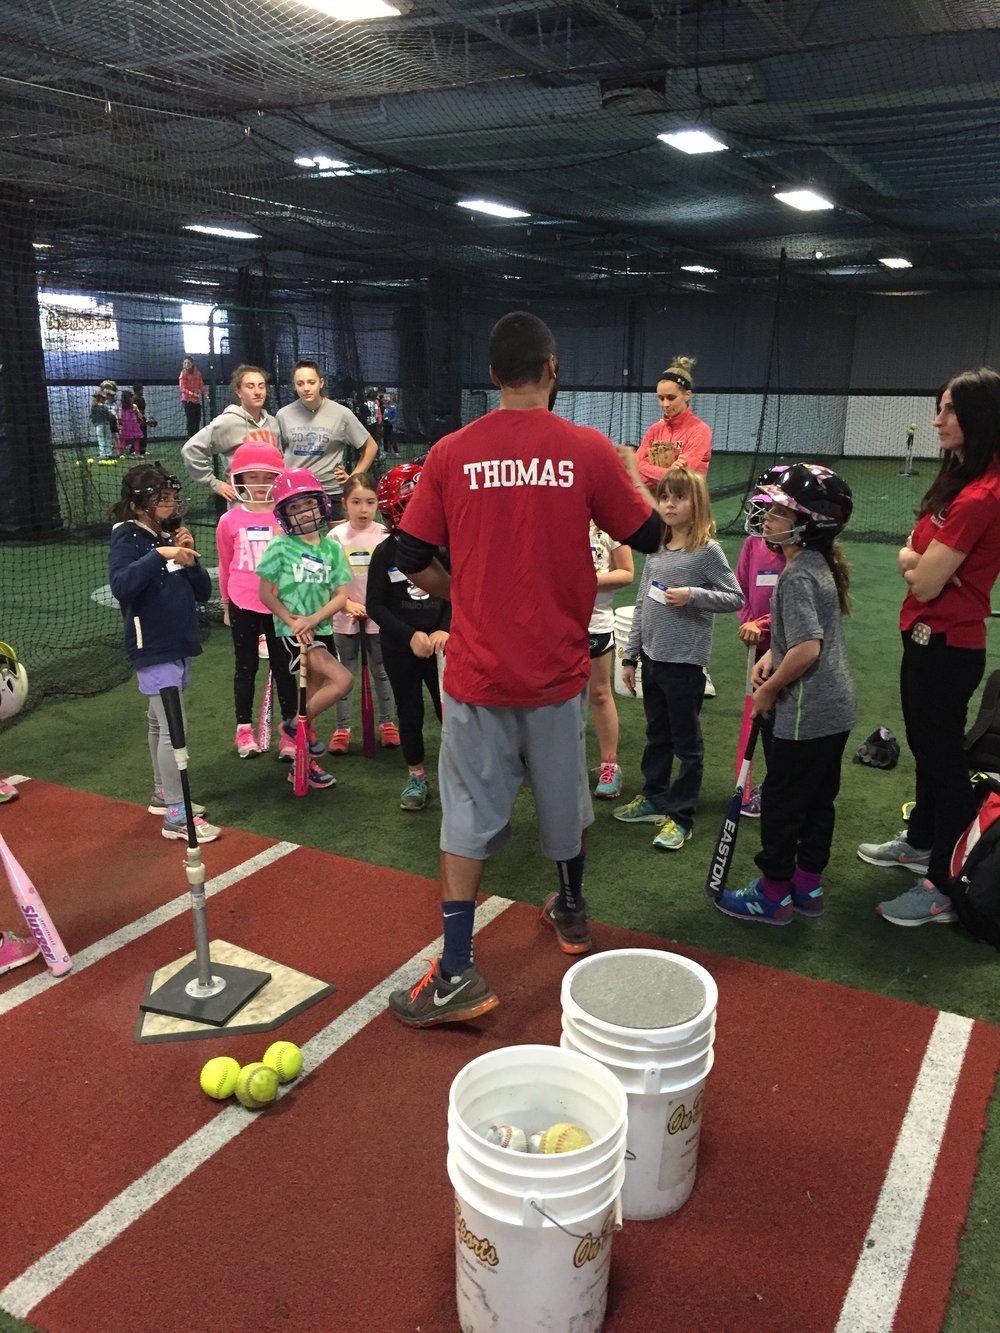 Jon Thomas Softball Clinic.jpg